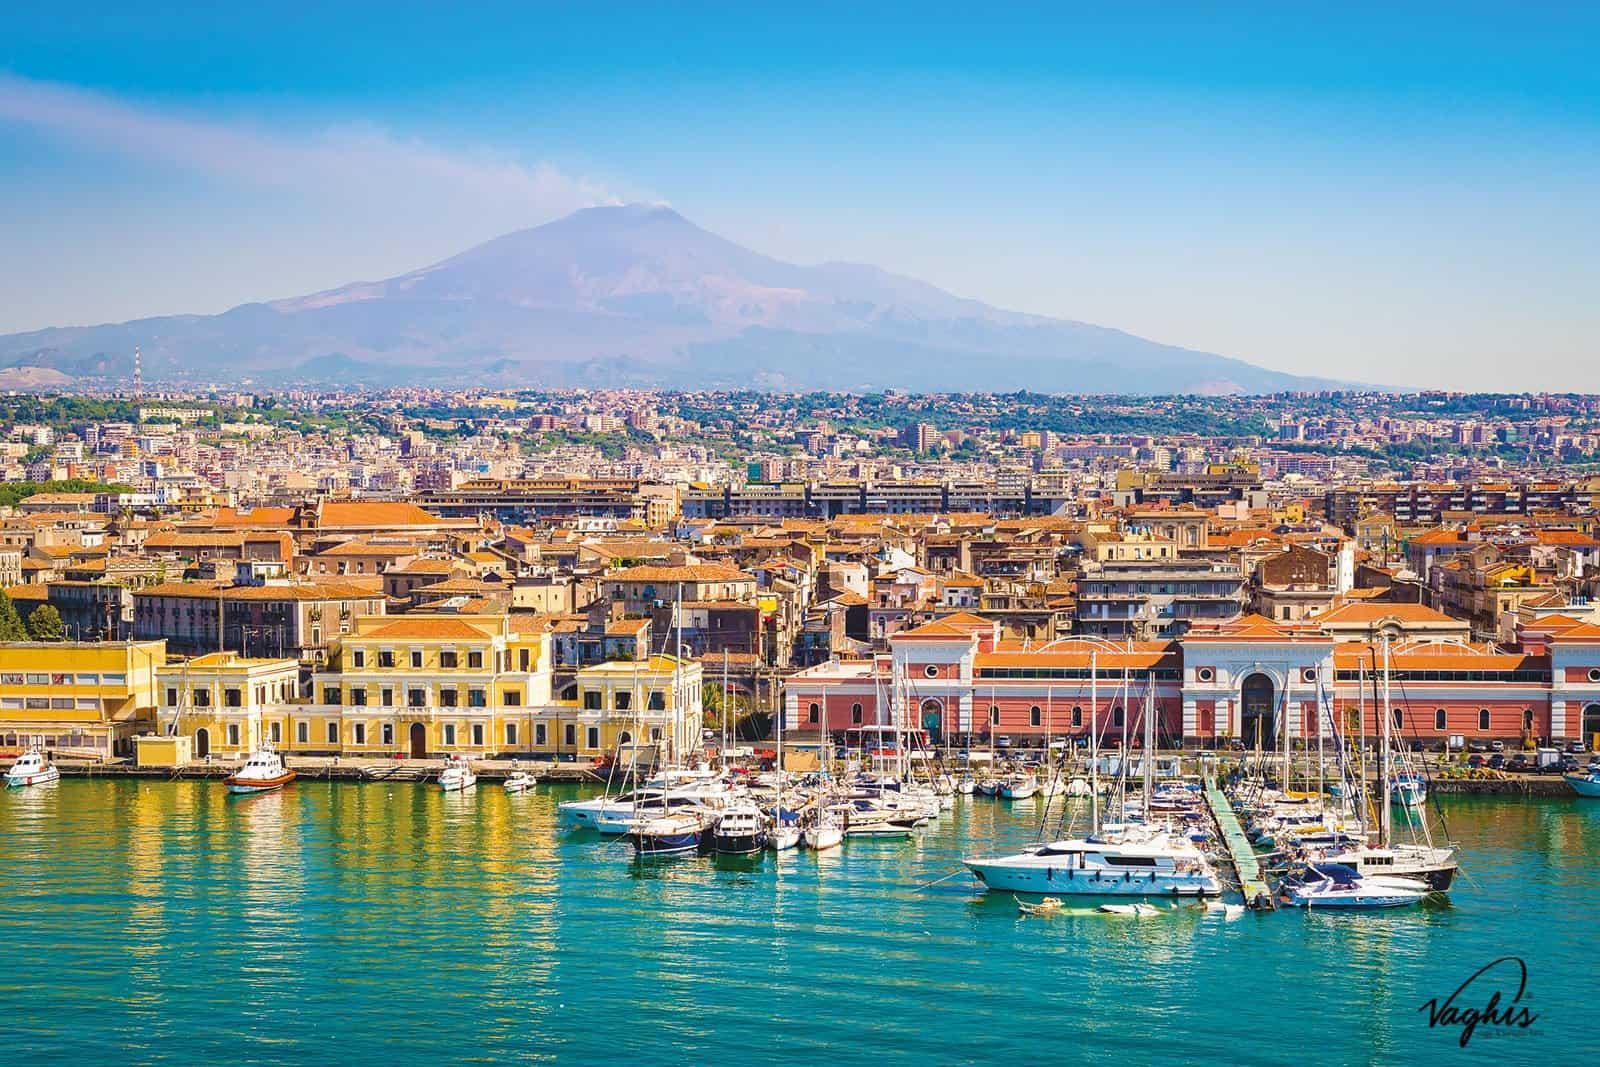 Catania - © Vaghis - Viaggi & turismo Italia - Tutti i diritti riservati